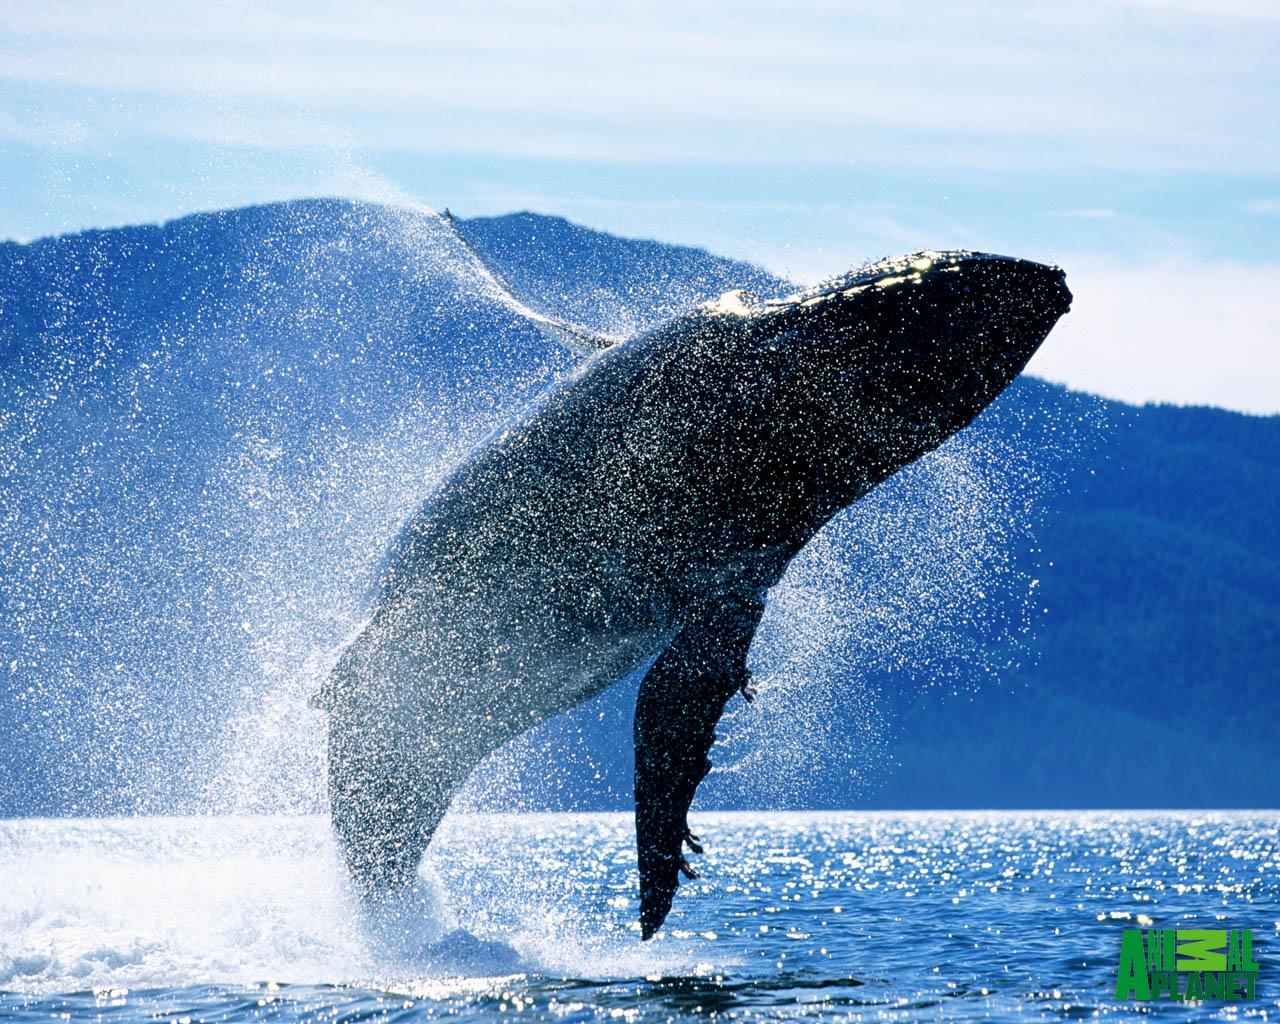 WhalesWallpaperjpg 1280x1024